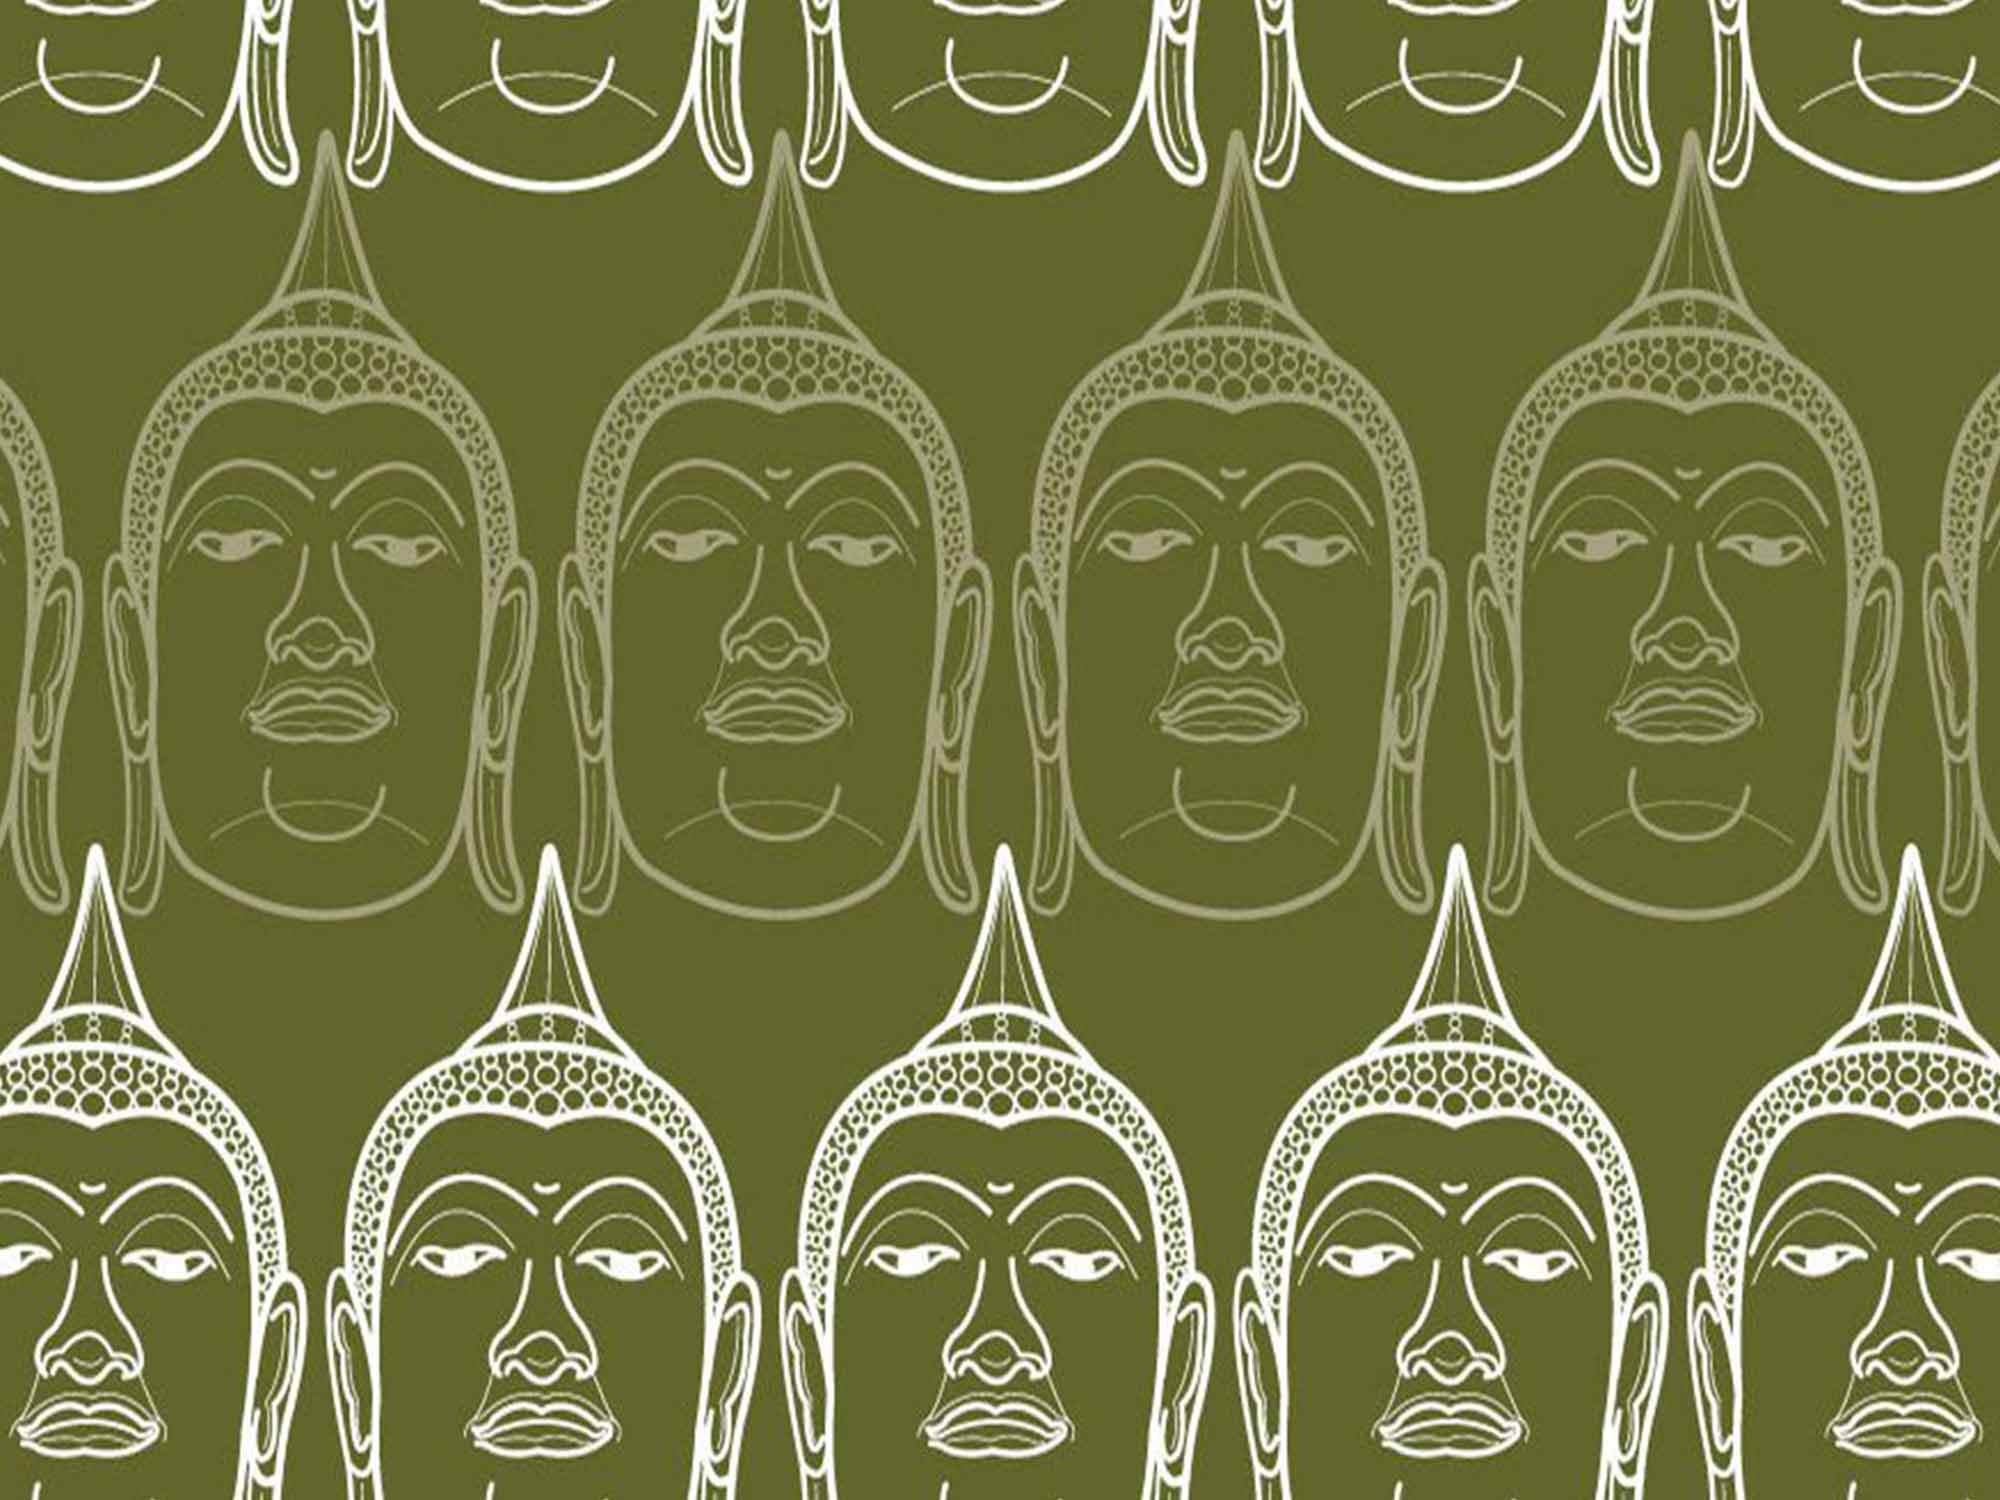 Papel de Parede Indiano 0002 - Adesivos de Parede  - Paredes Decoradas